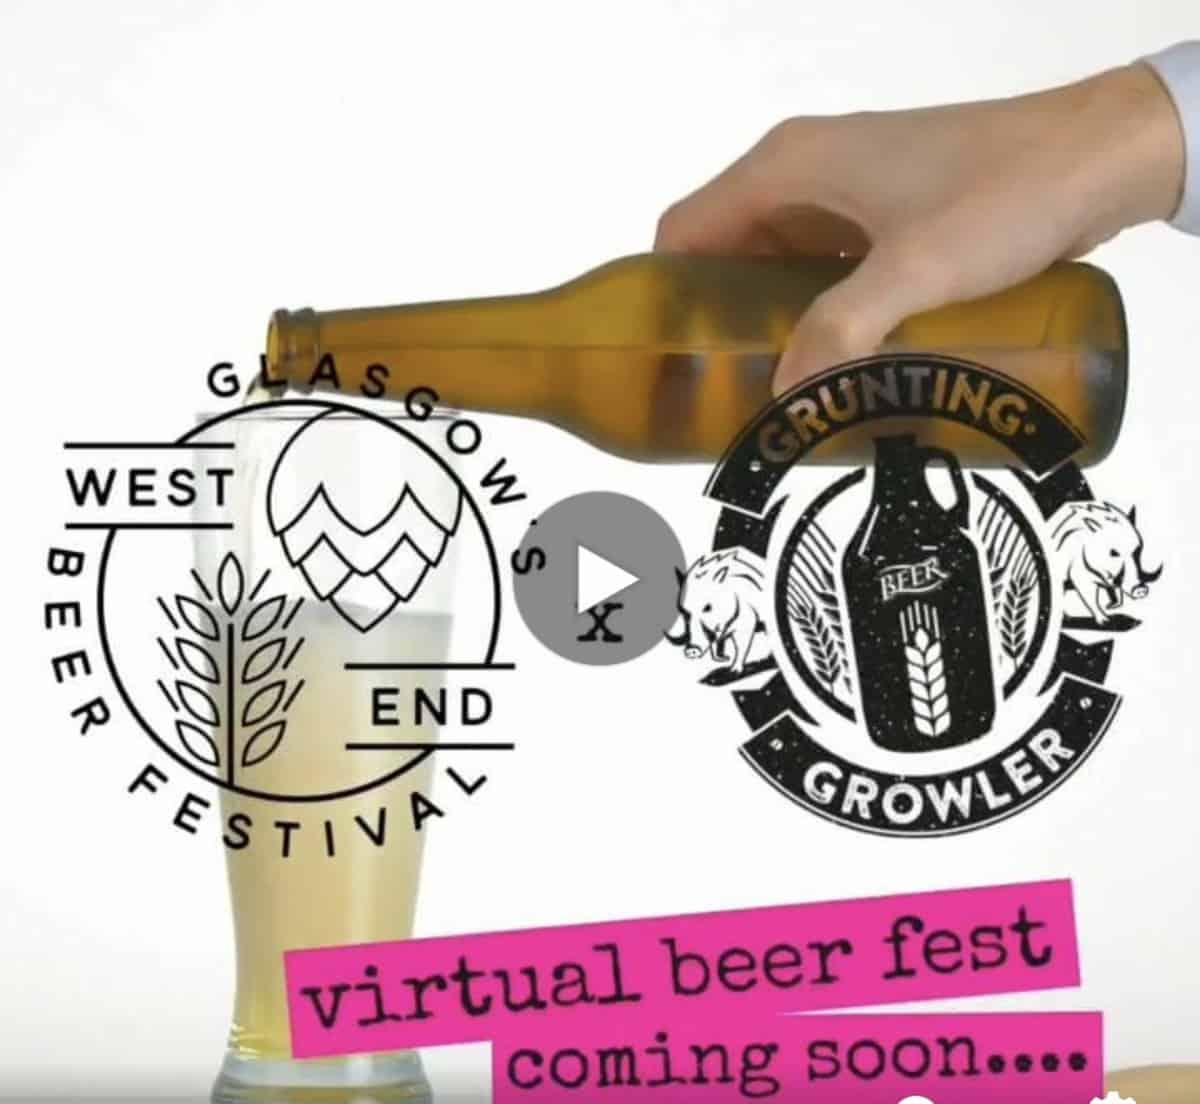 West end beer festival virtual beer festival